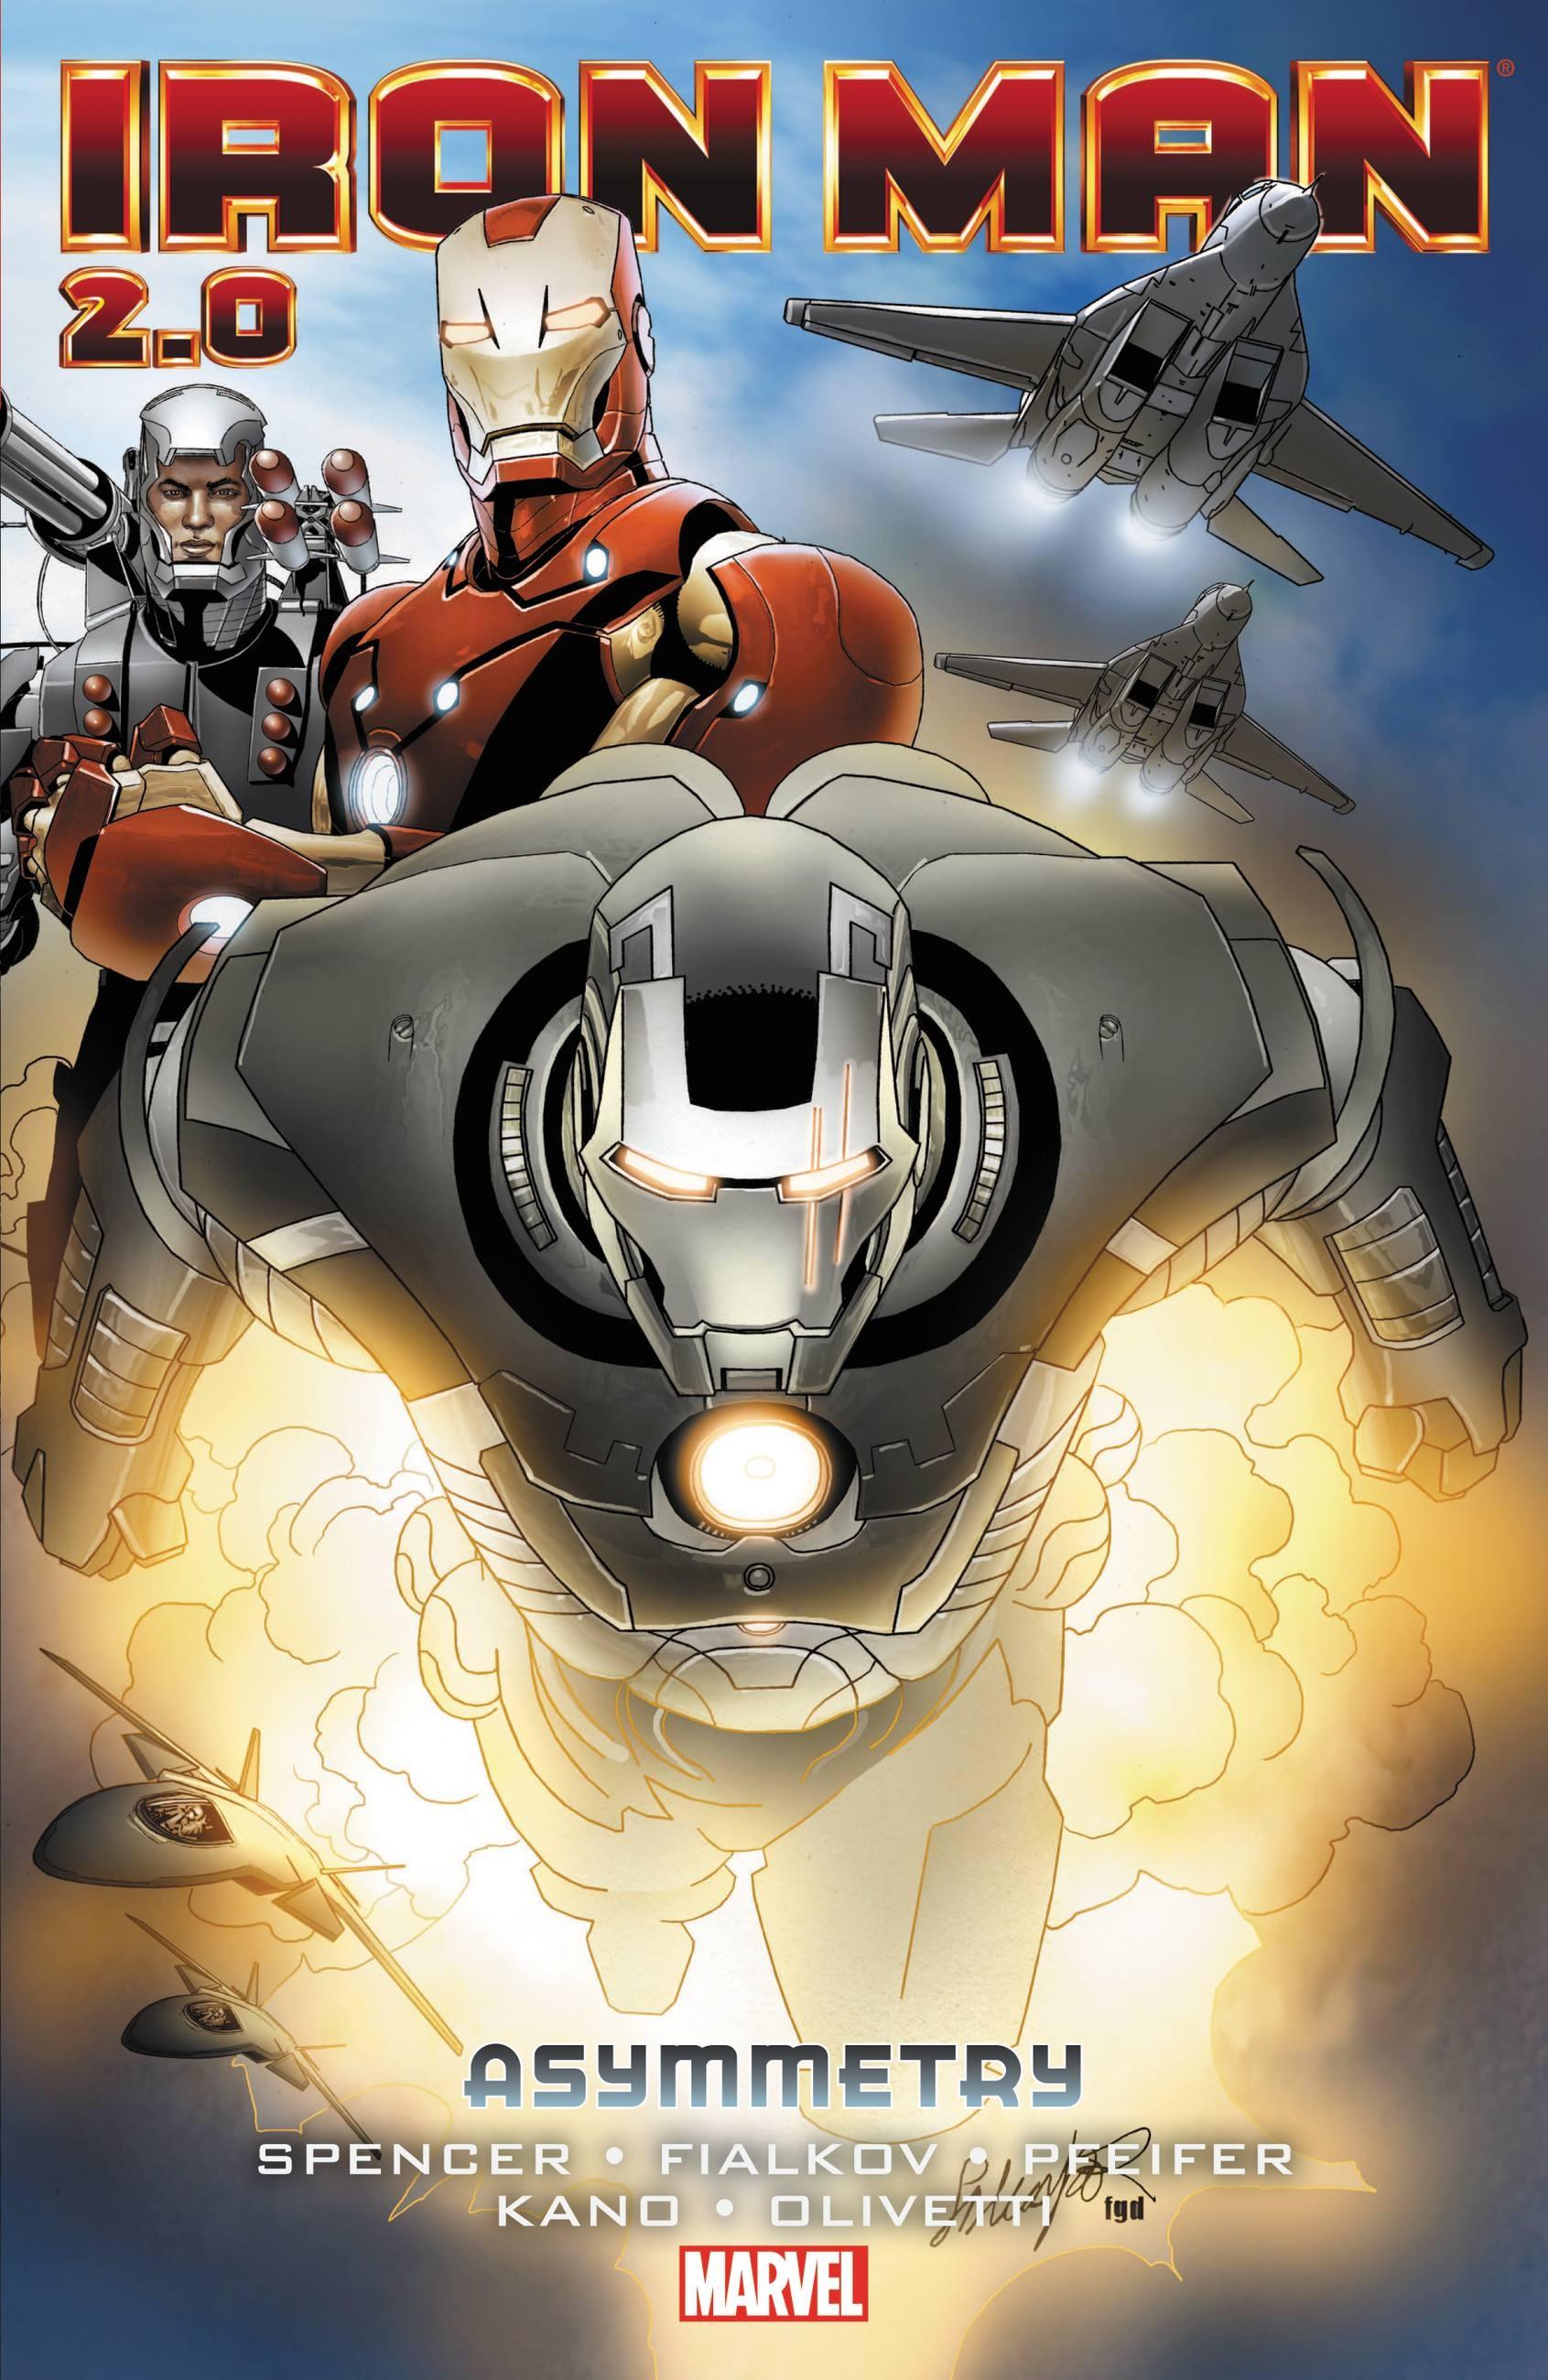 Iron Man 2.0 - Volume 2 power man and iron fist volume 2 civil war ii